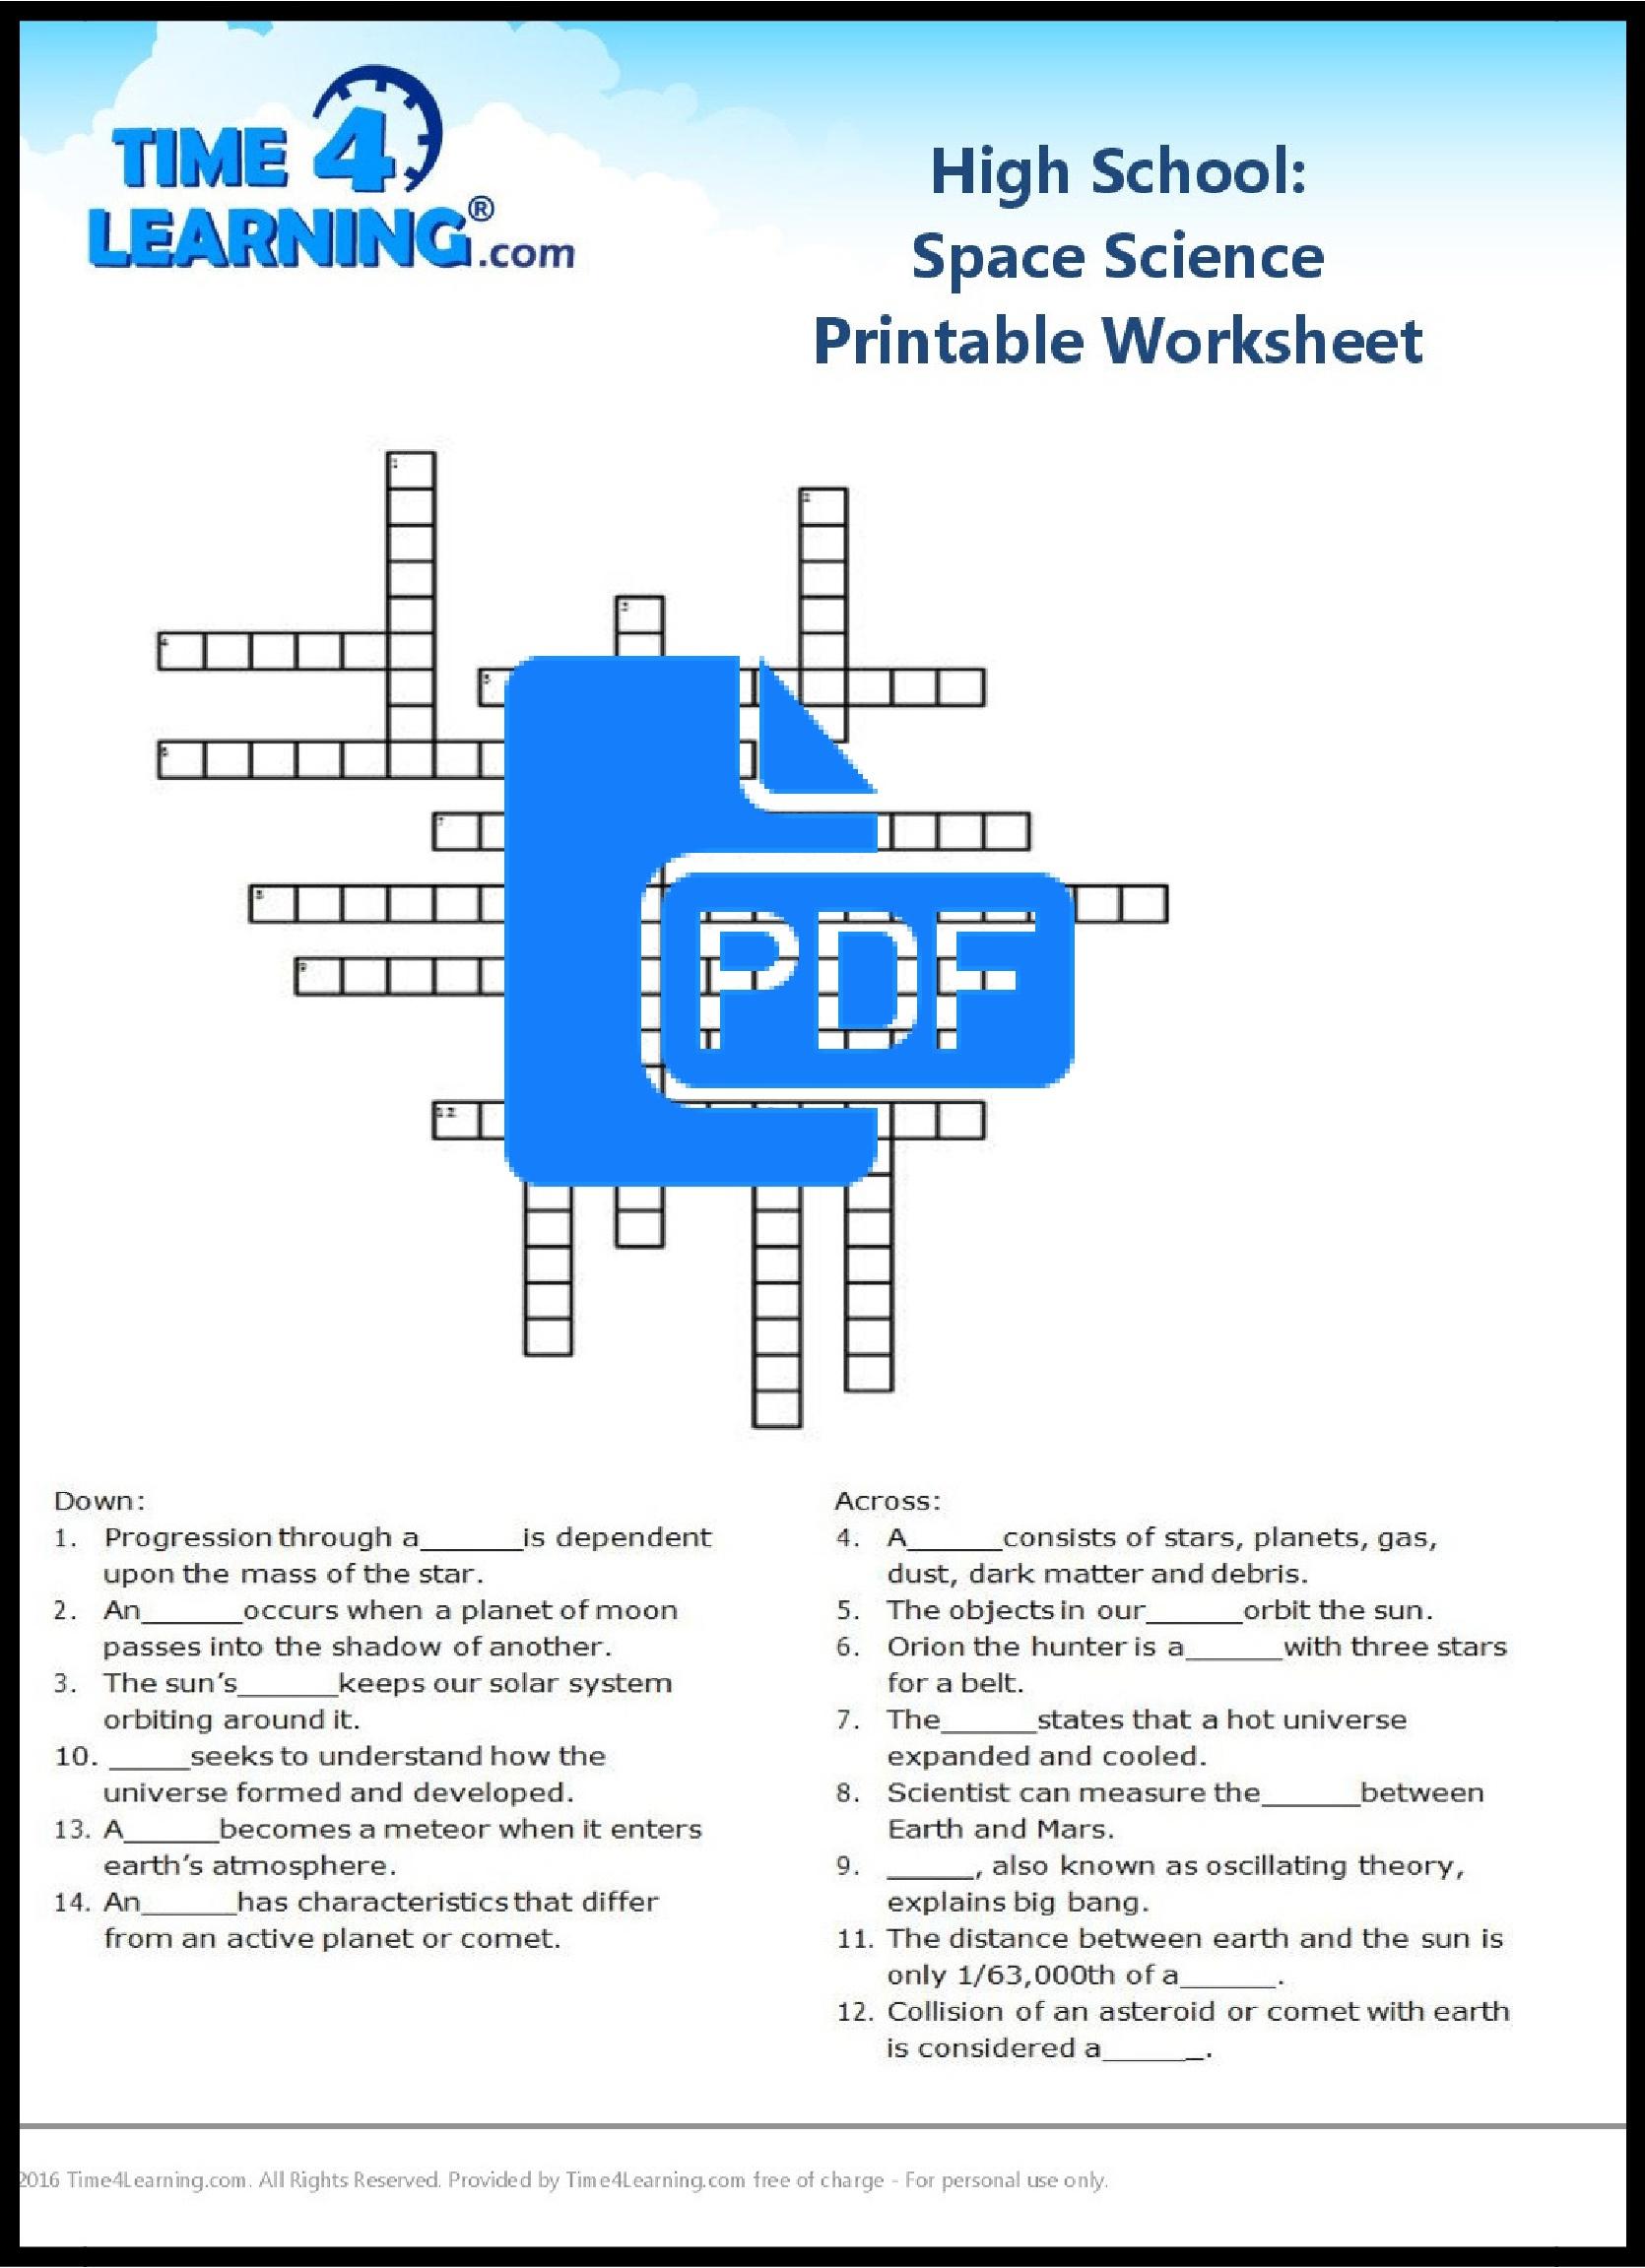 Free Printable: High School Space Science Worksheet | Time4Learning - Free Printable Biology Worksheets For High School